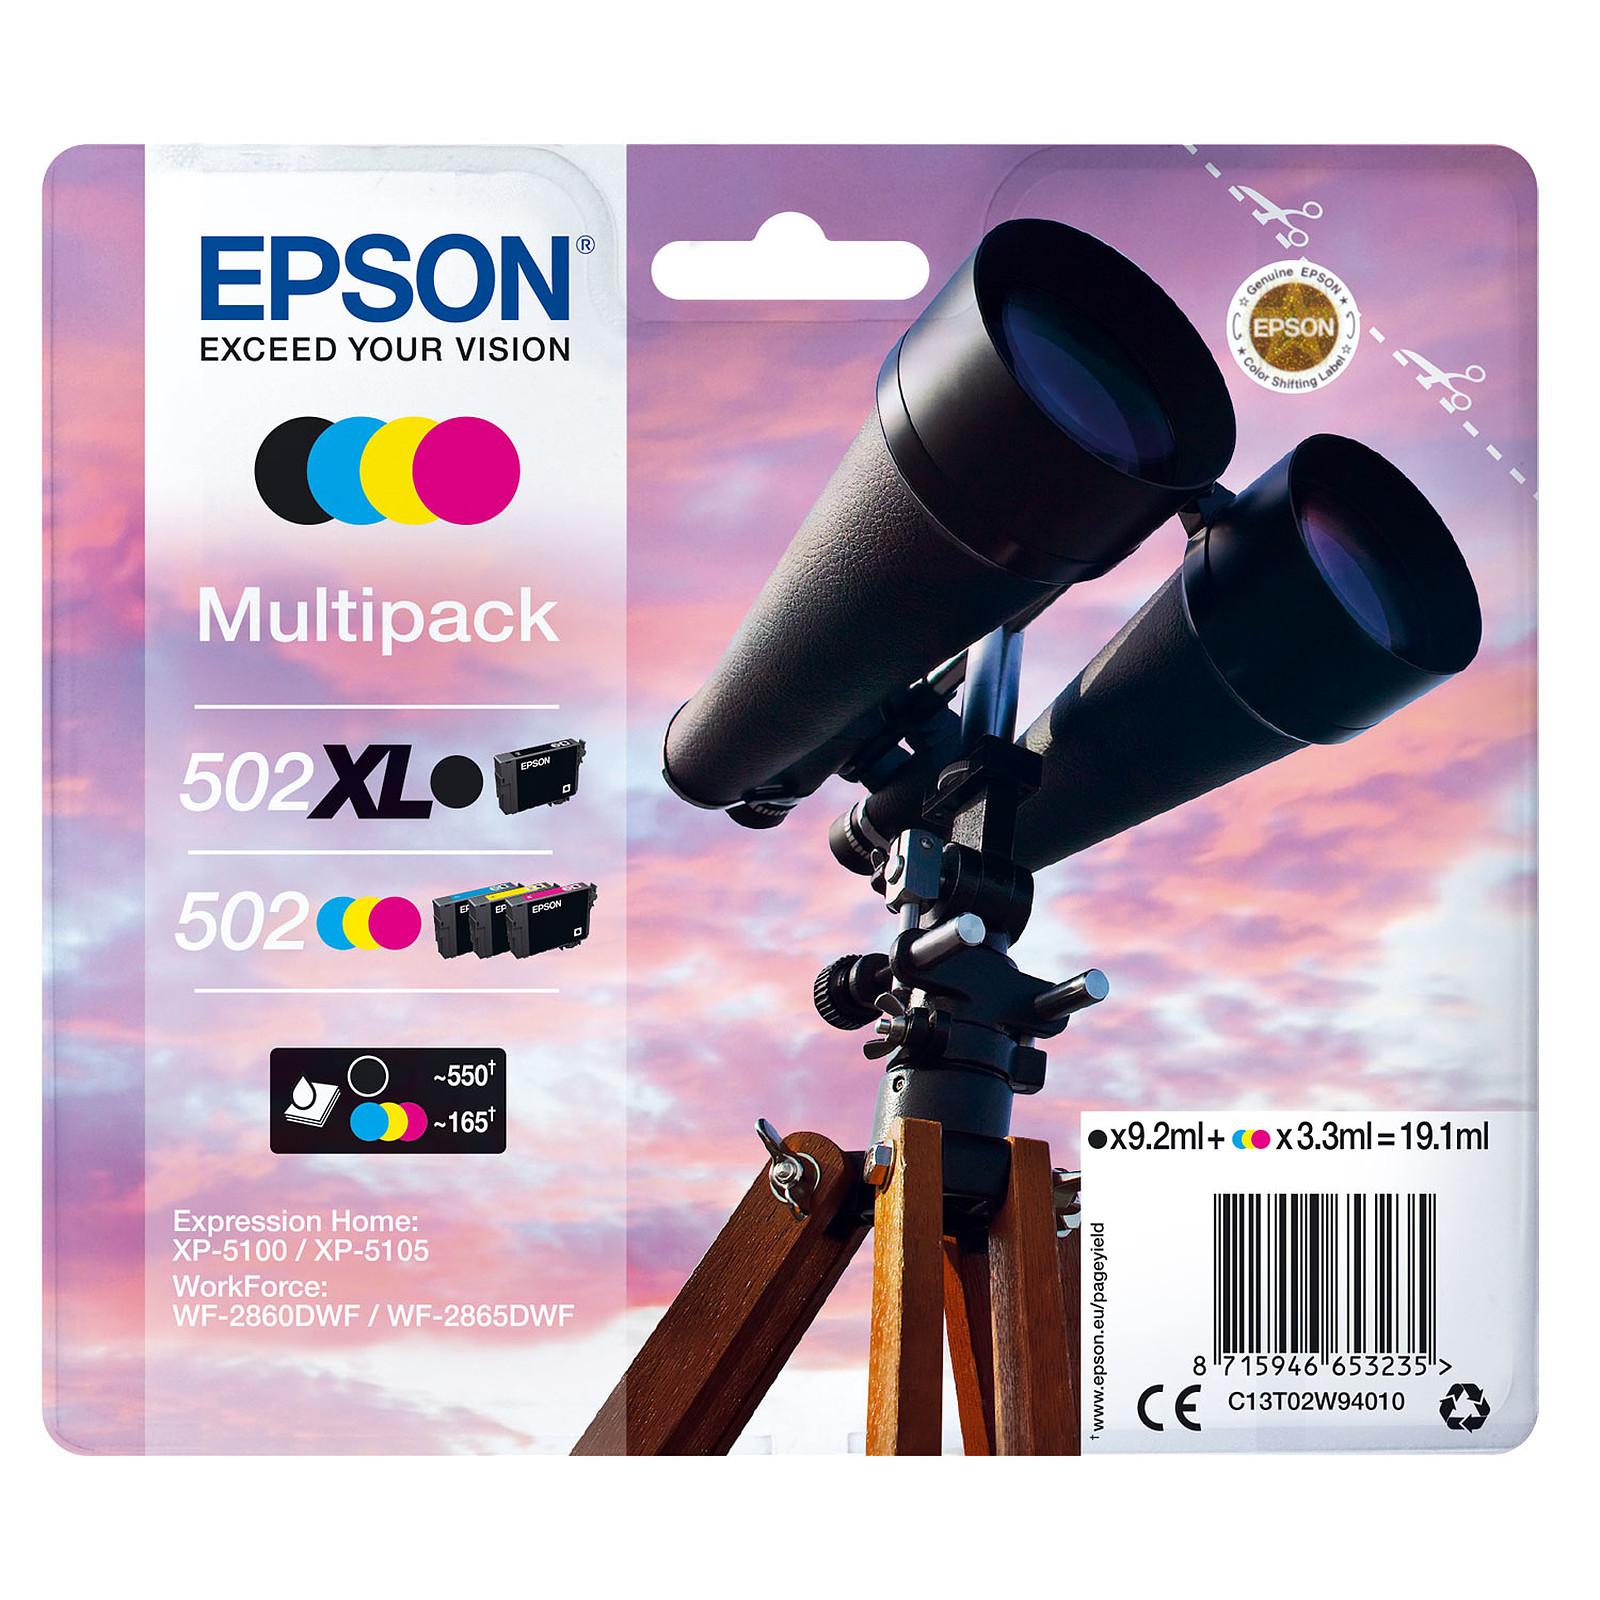 Epson Binoculares 502XL Negro + Cian/Magenta/Negro Standard